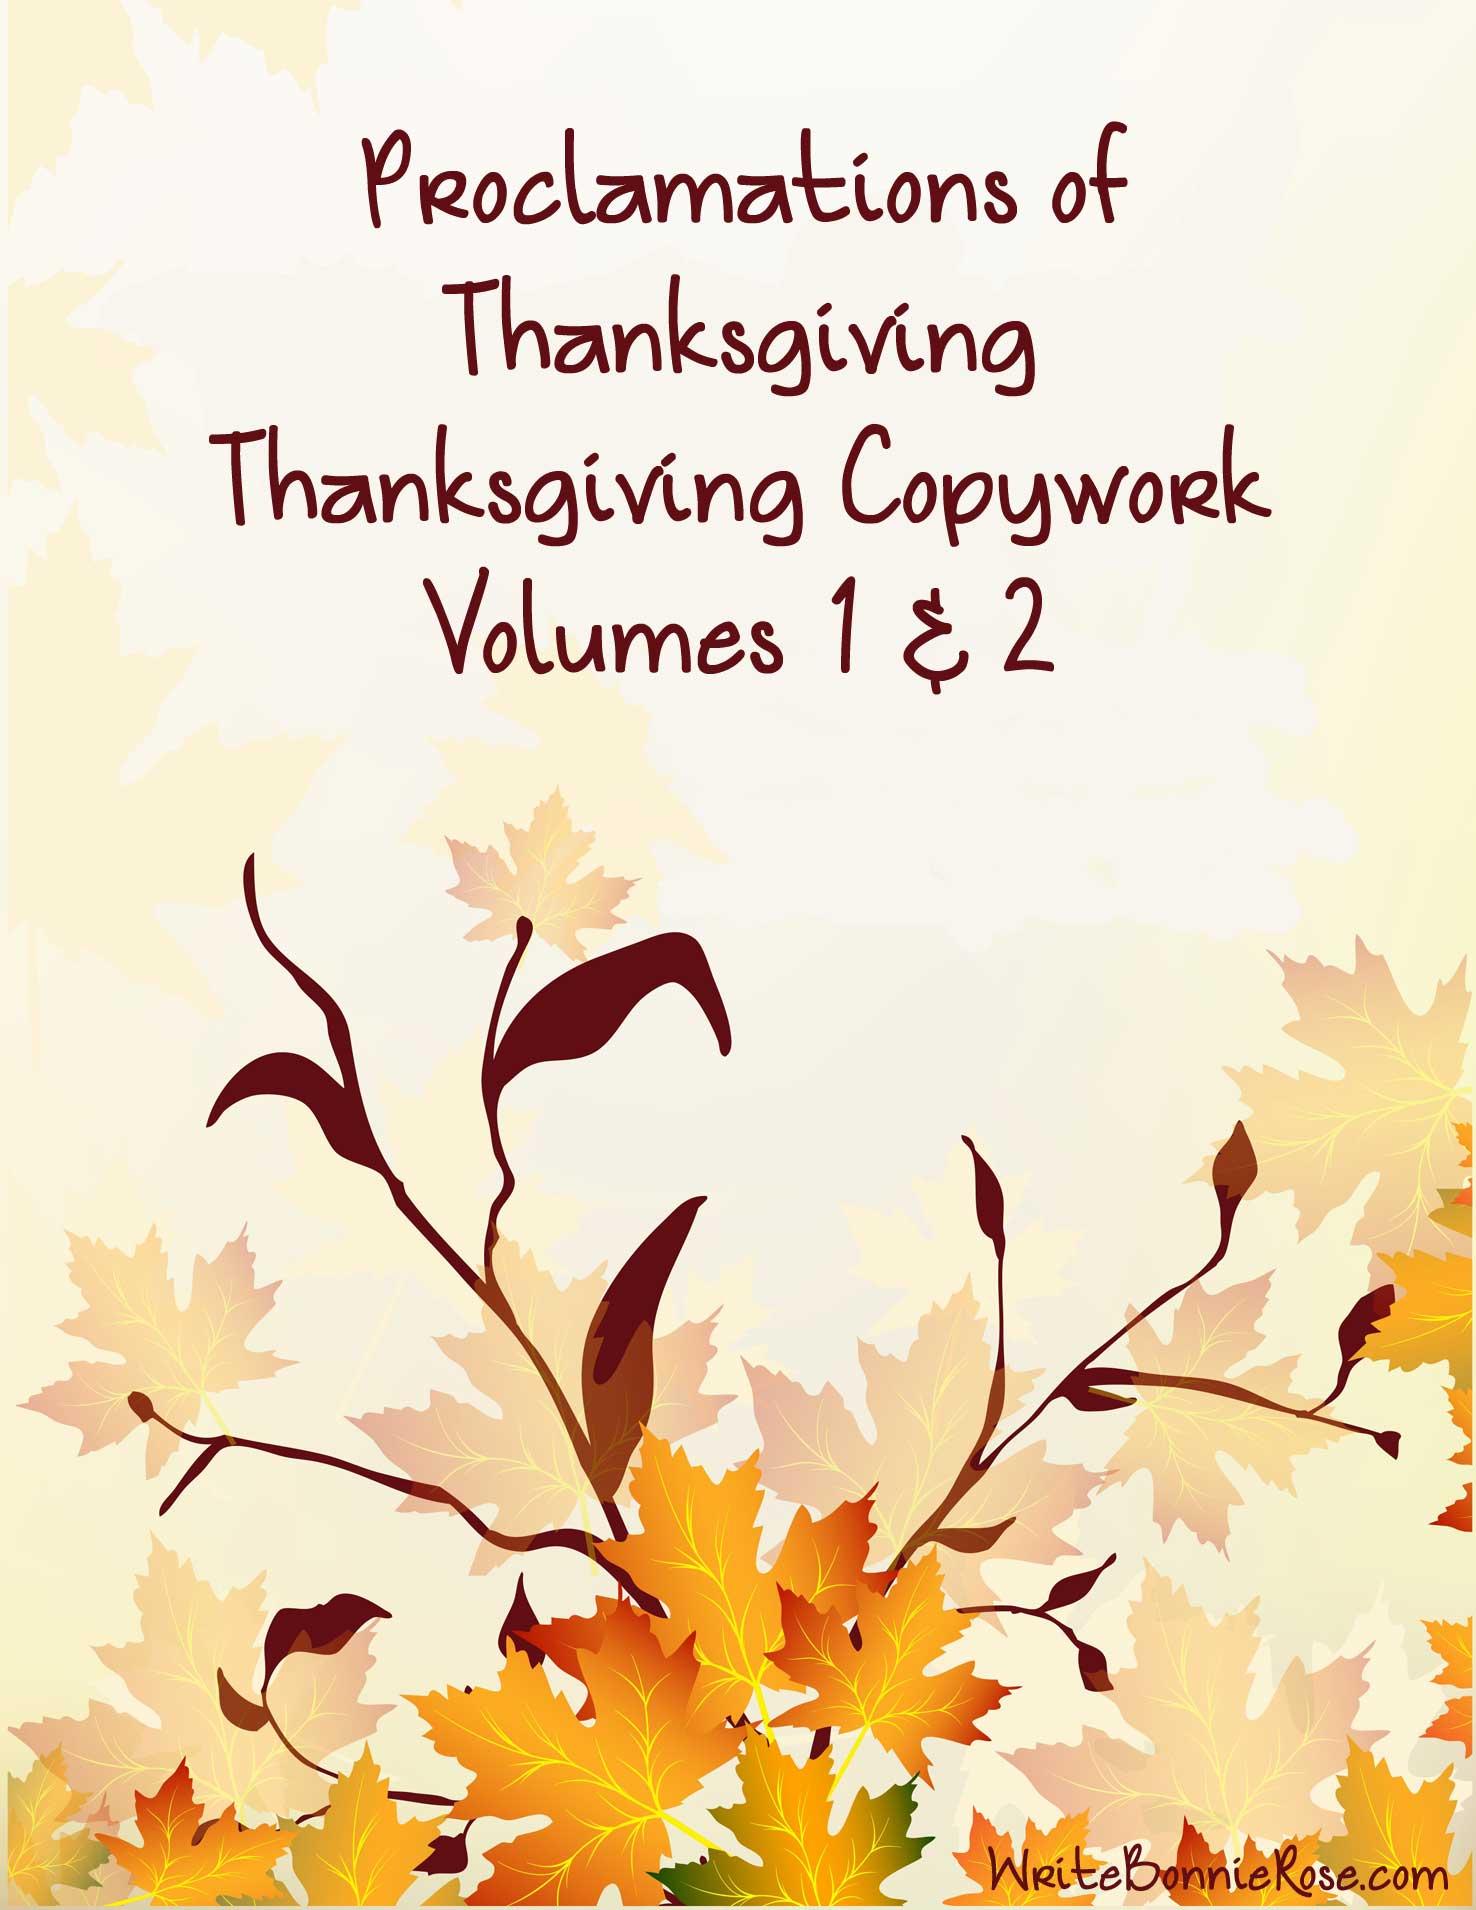 FREE Thanksgiving Copywork (2 Volumes)